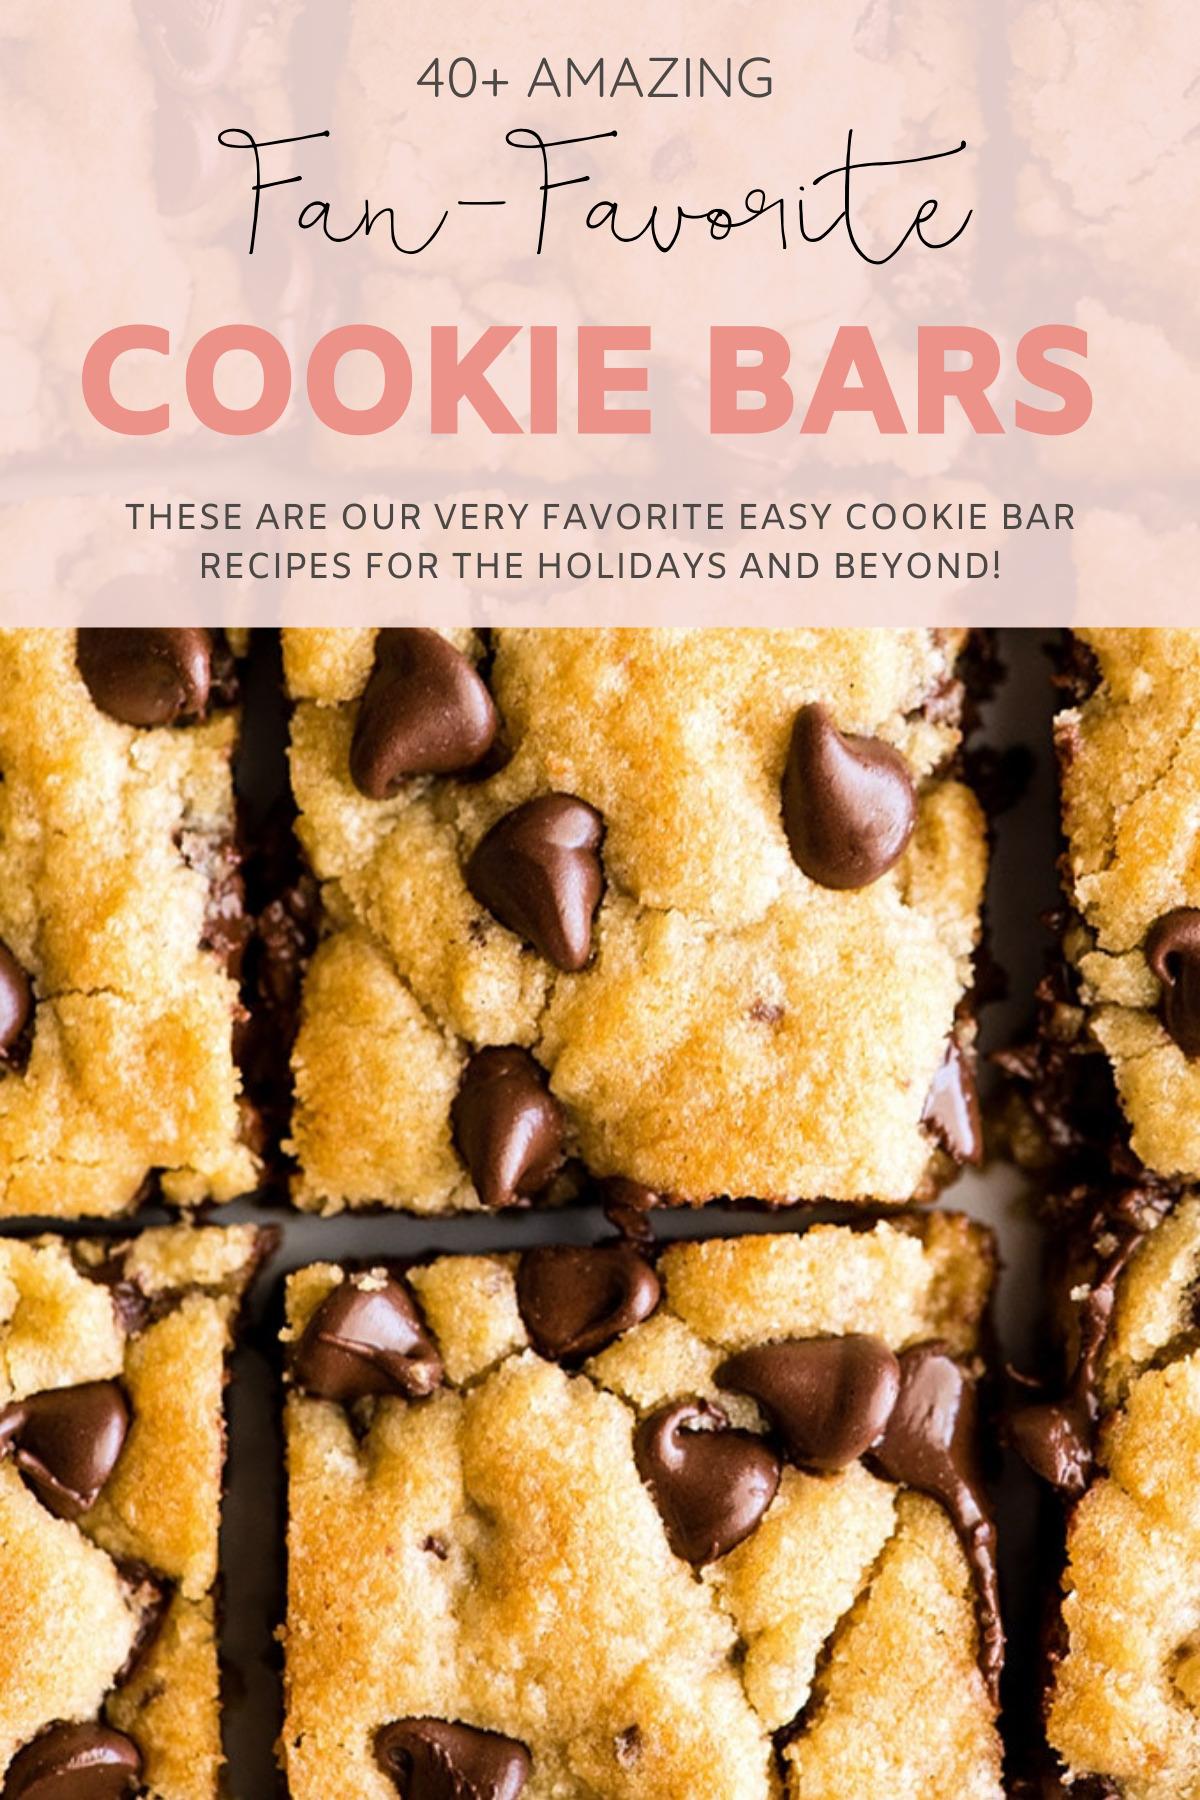 40+ Amazing Cookie Bars Recipes